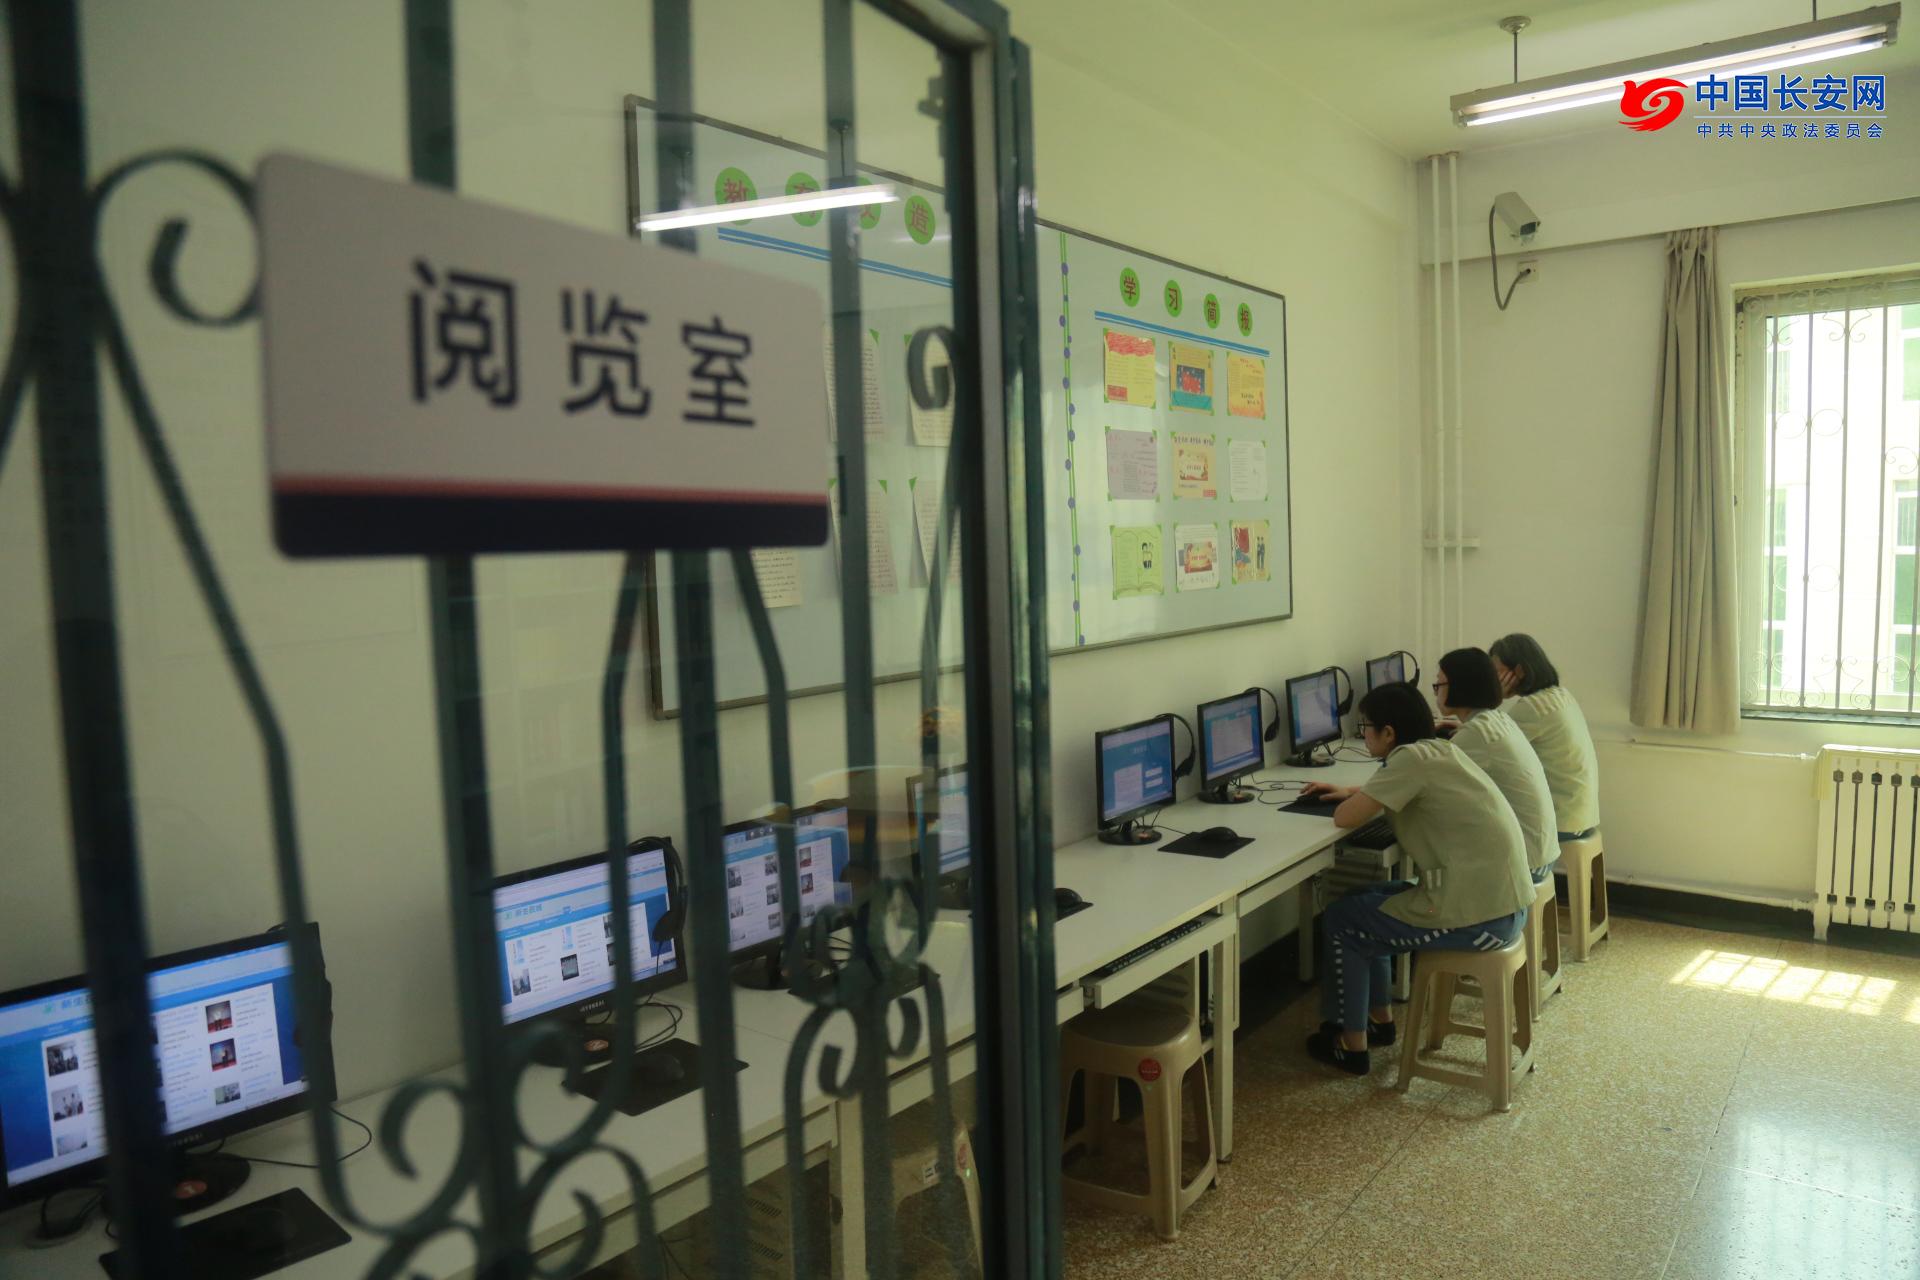 VR体验馆、谋生技能get……带你走进北京女子监狱